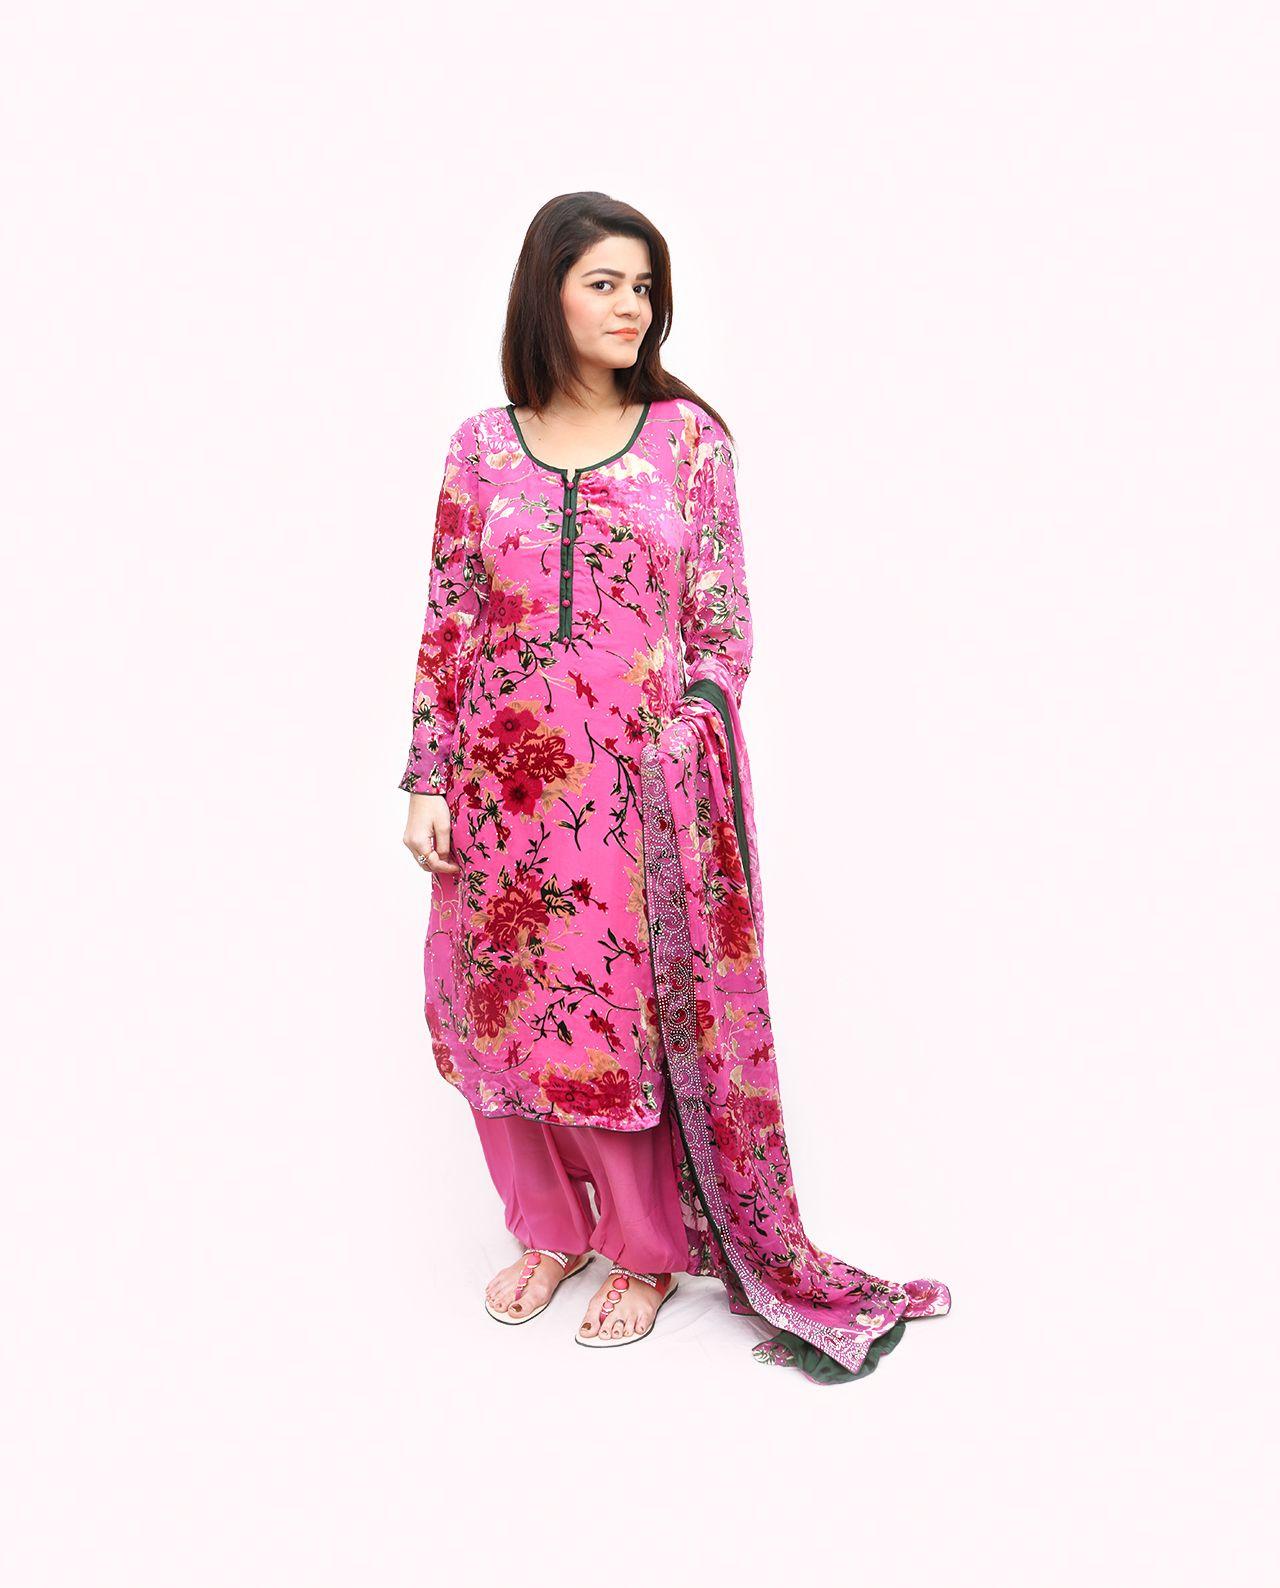 2db0f3fa4f Palachi Salwar Kameez With Beads Deisgn   Things to Wear   Shalwar ...